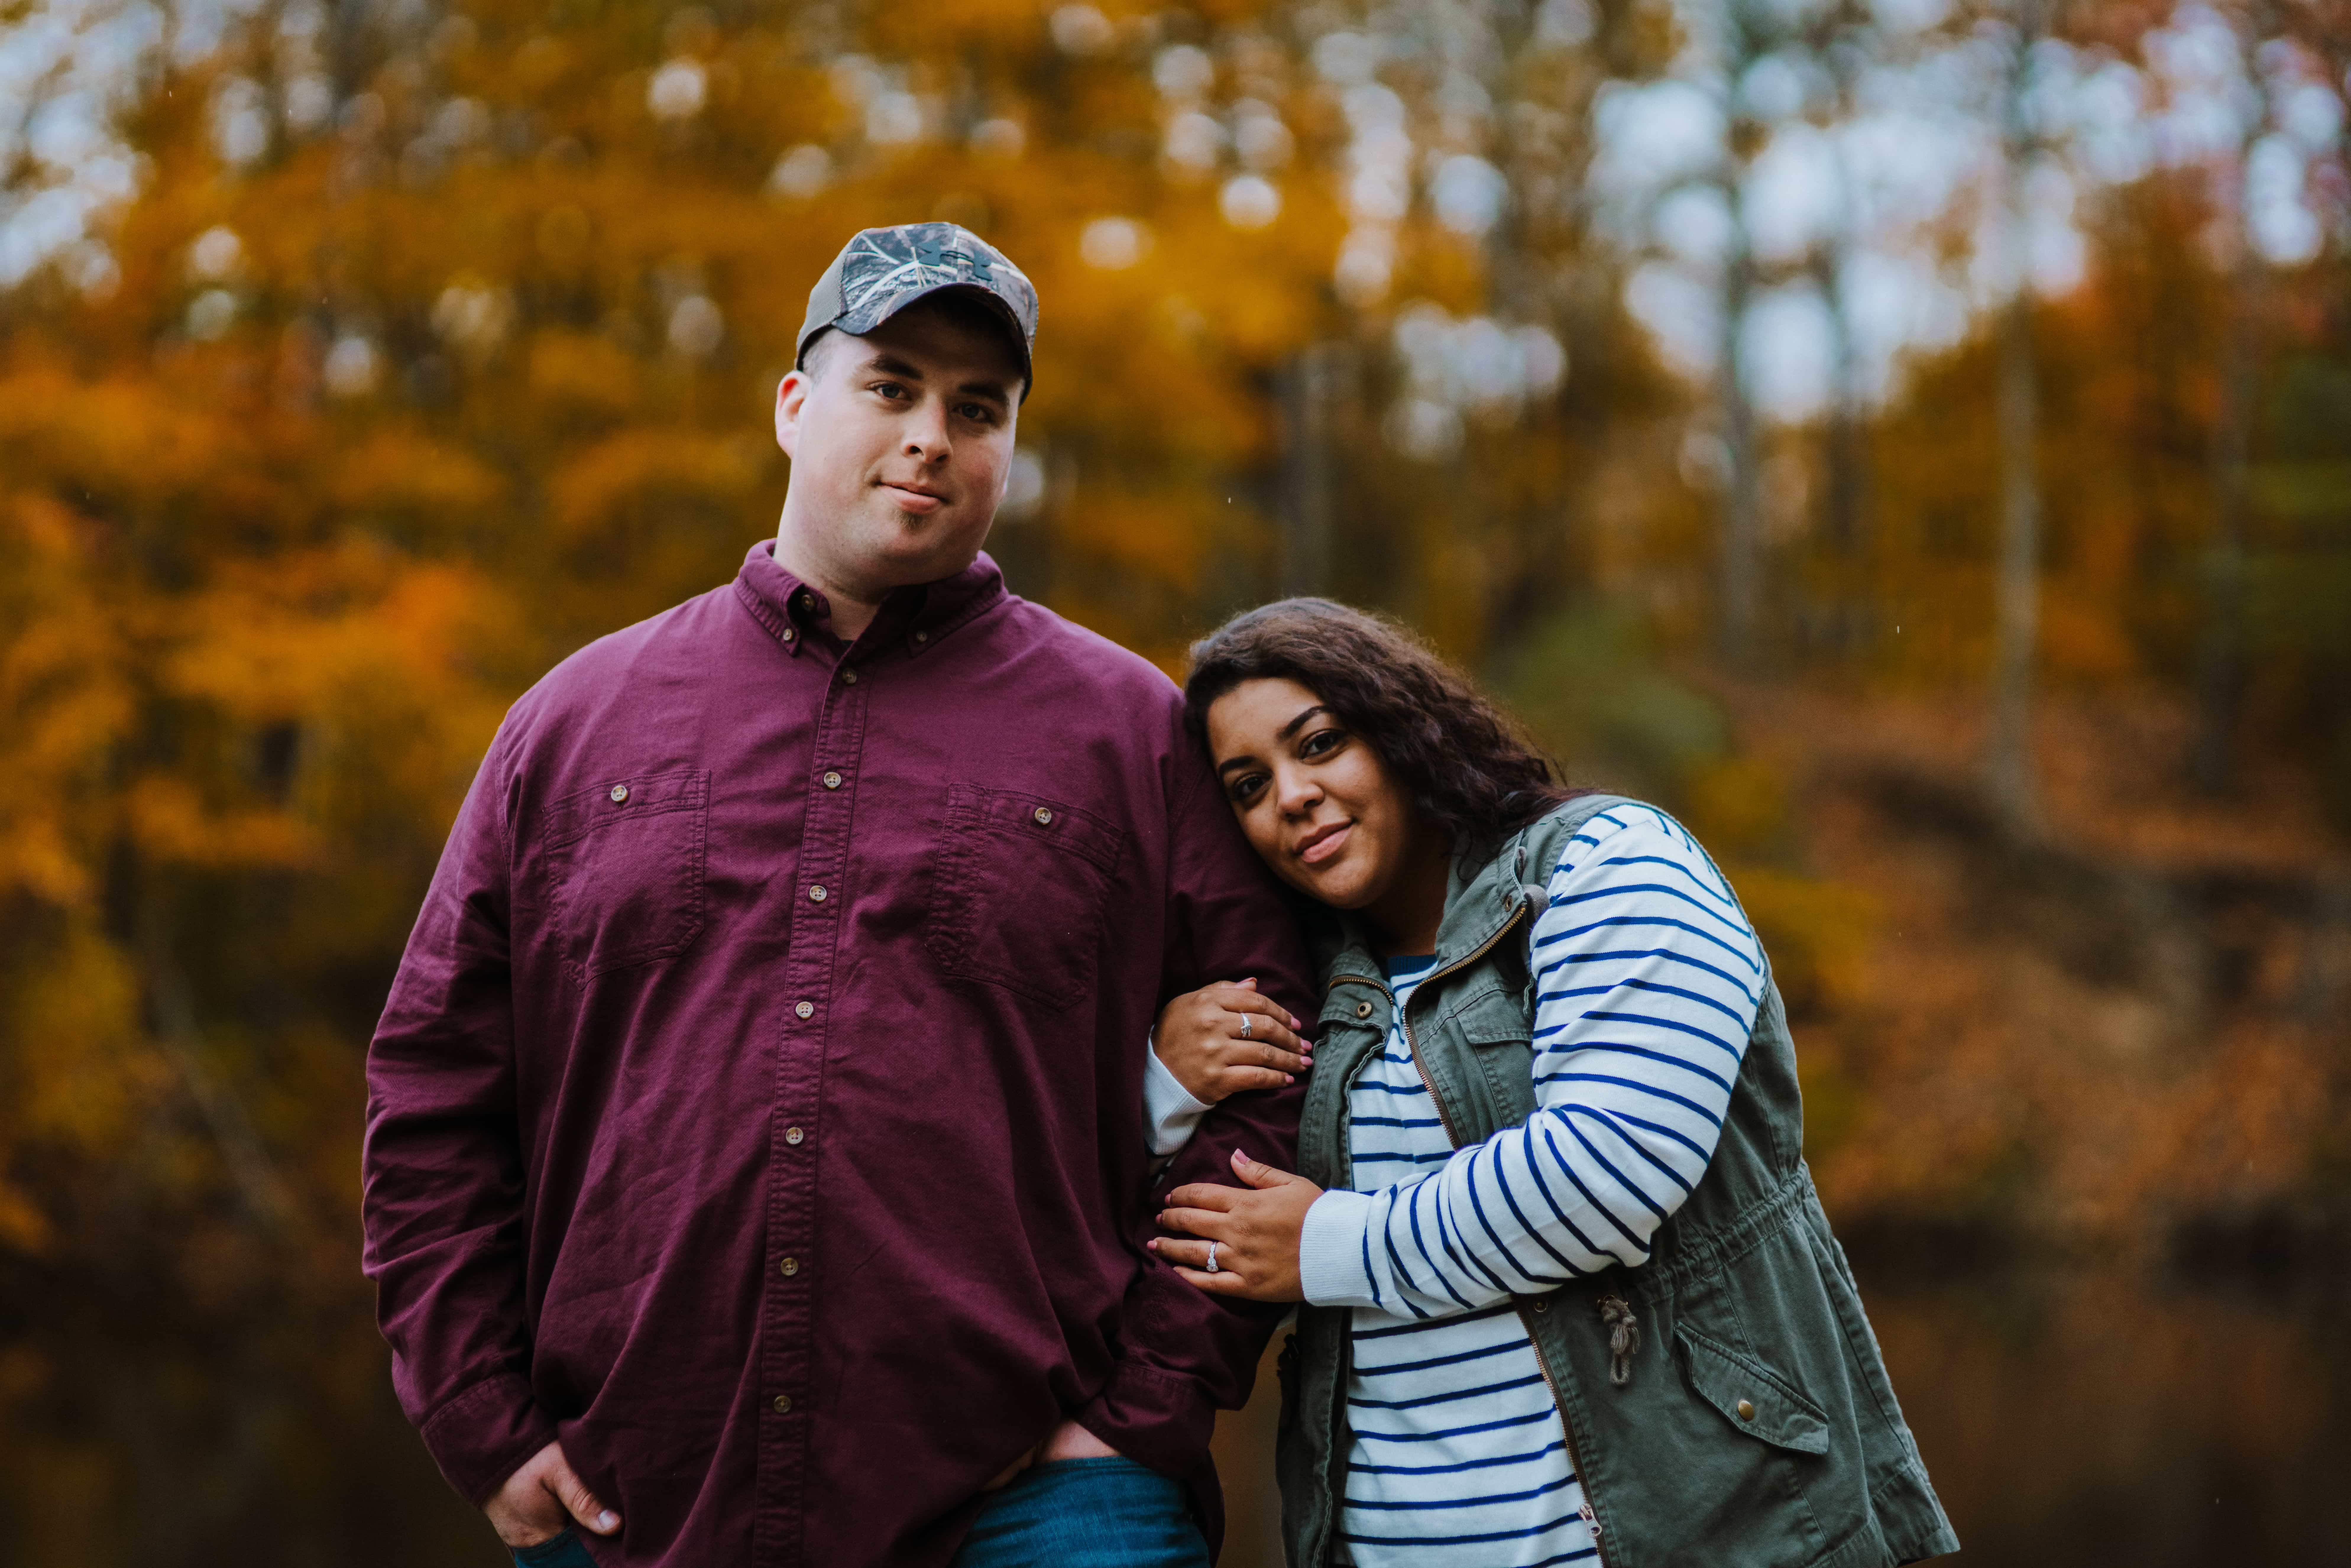 Lincoln Brick Park Engagement | Jasmine & Ricky